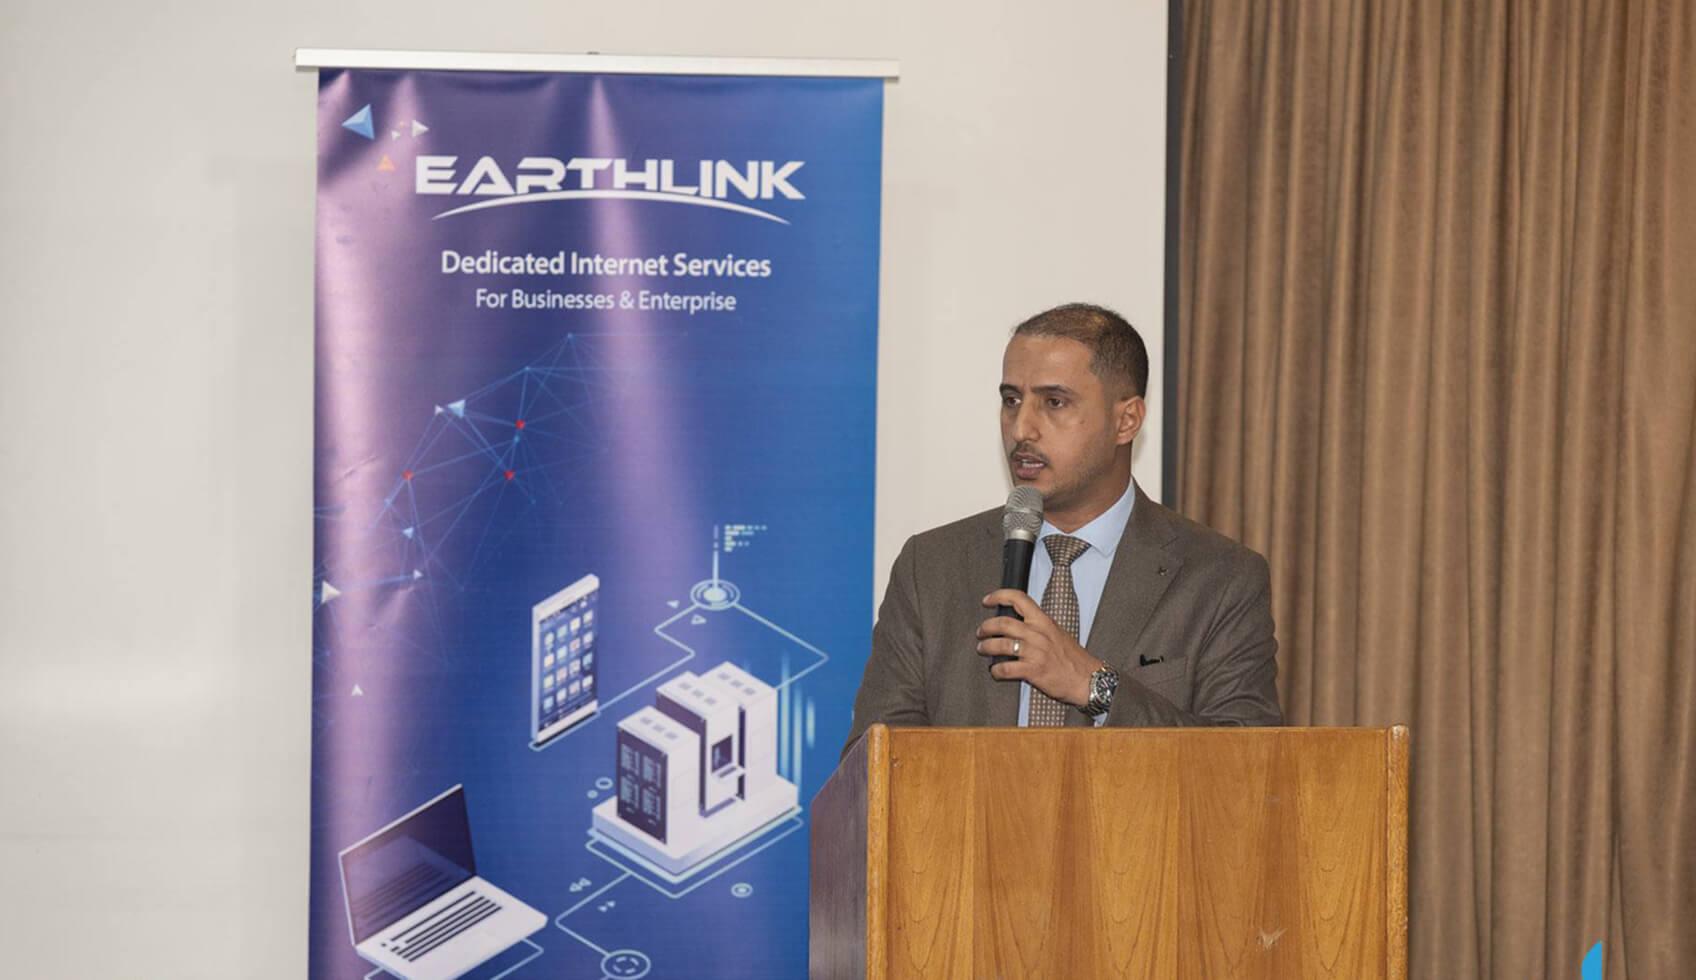 Dr. Jassem Aboud Al Dabbagh speach